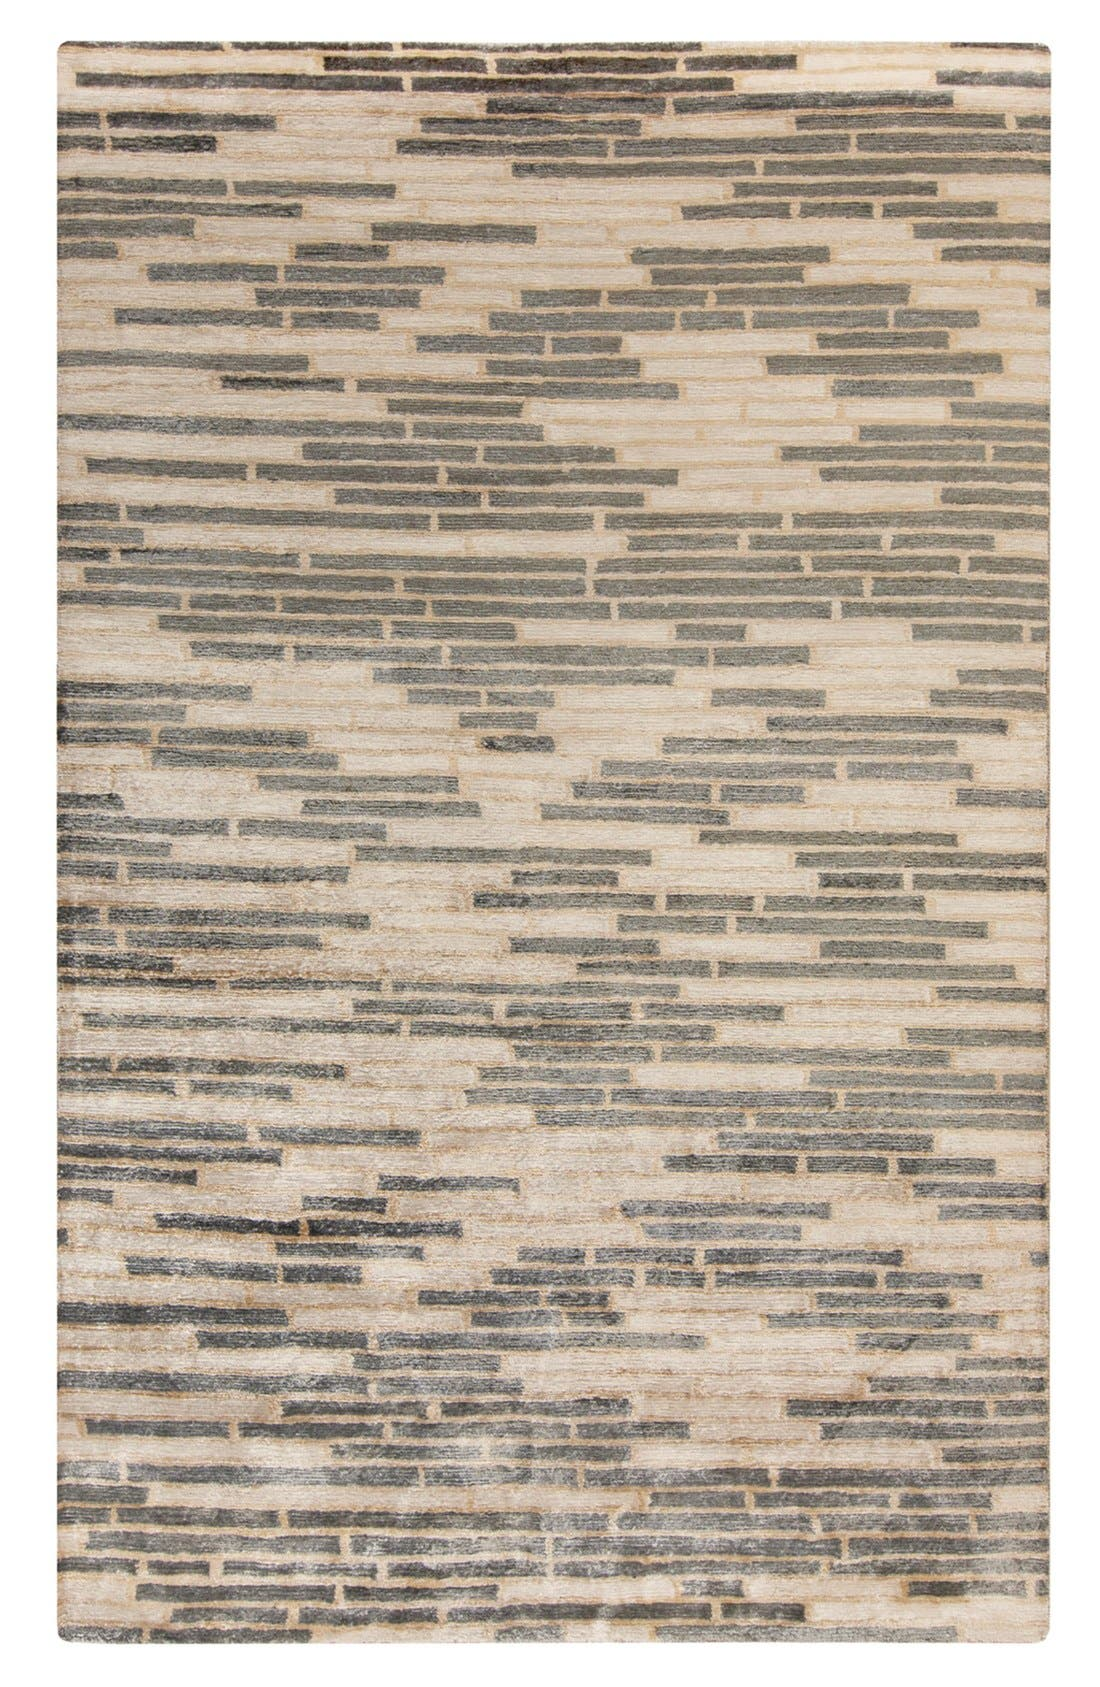 Alternate Image 1 Selected - Surya Home 'Platinum' Hand Tufted Rug